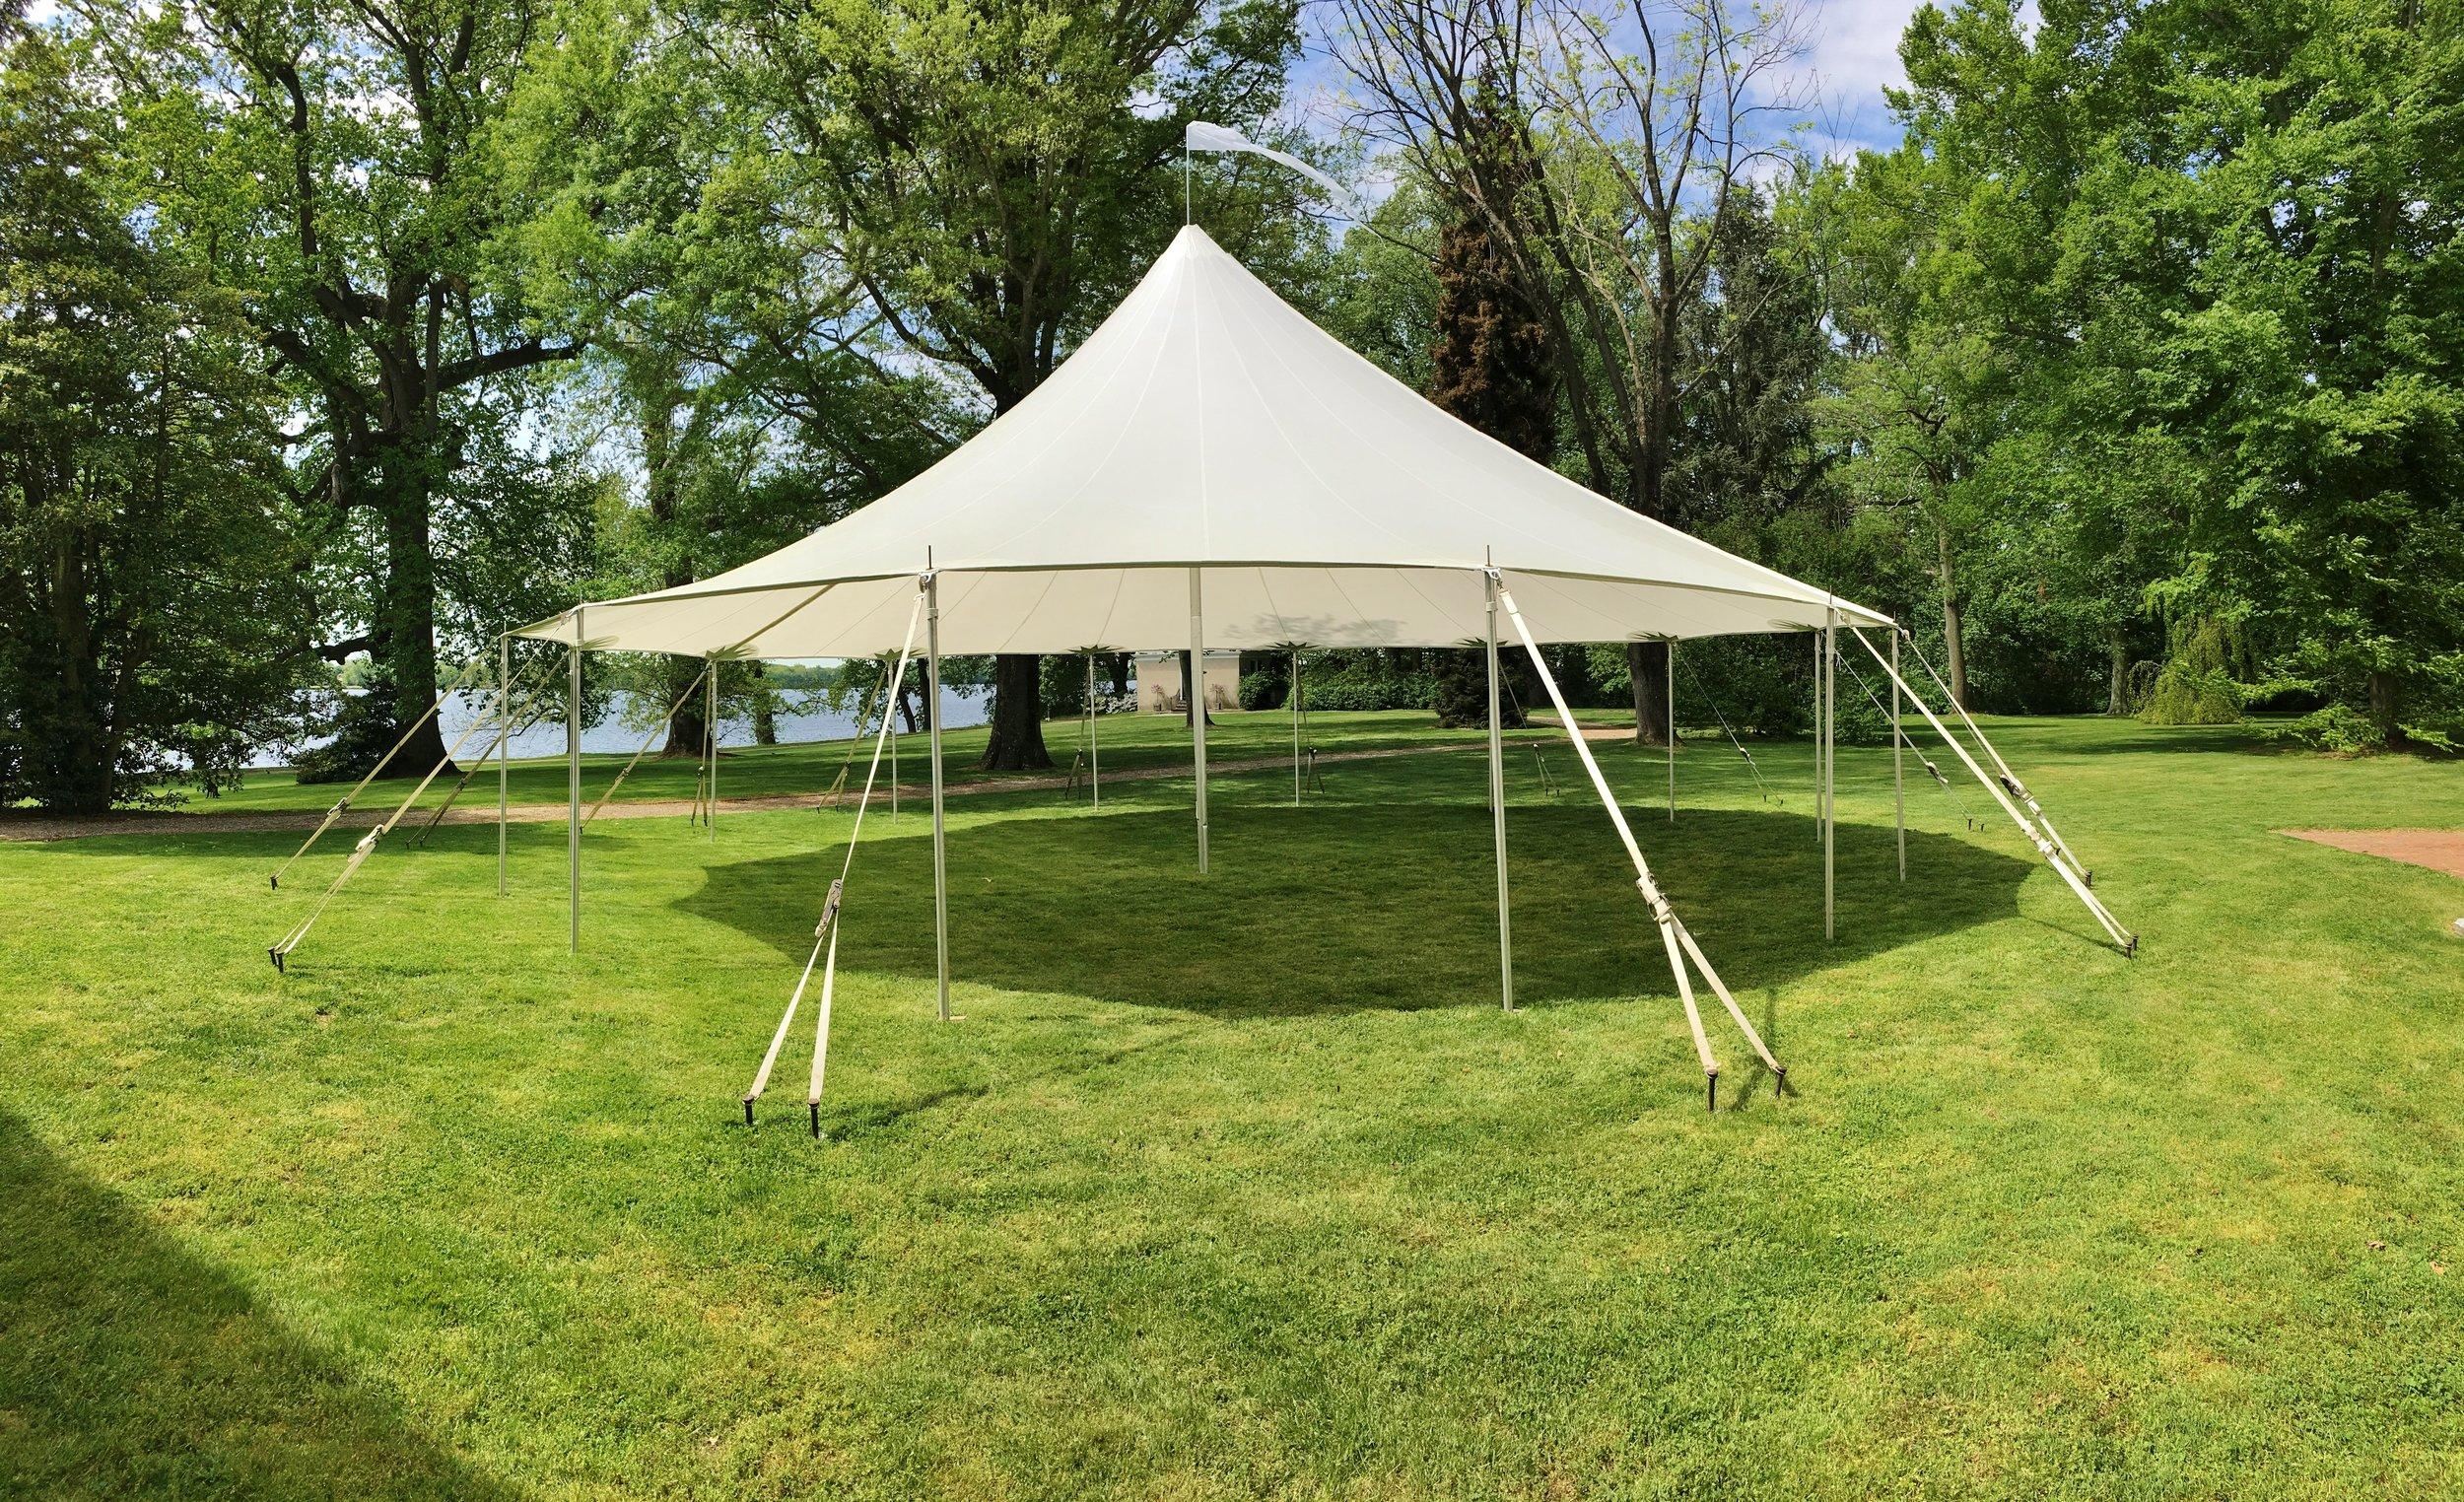 Hazleton-Pennsylvania-sail-cloth-tent-45x44-Tents-For-Rent-153.jpg